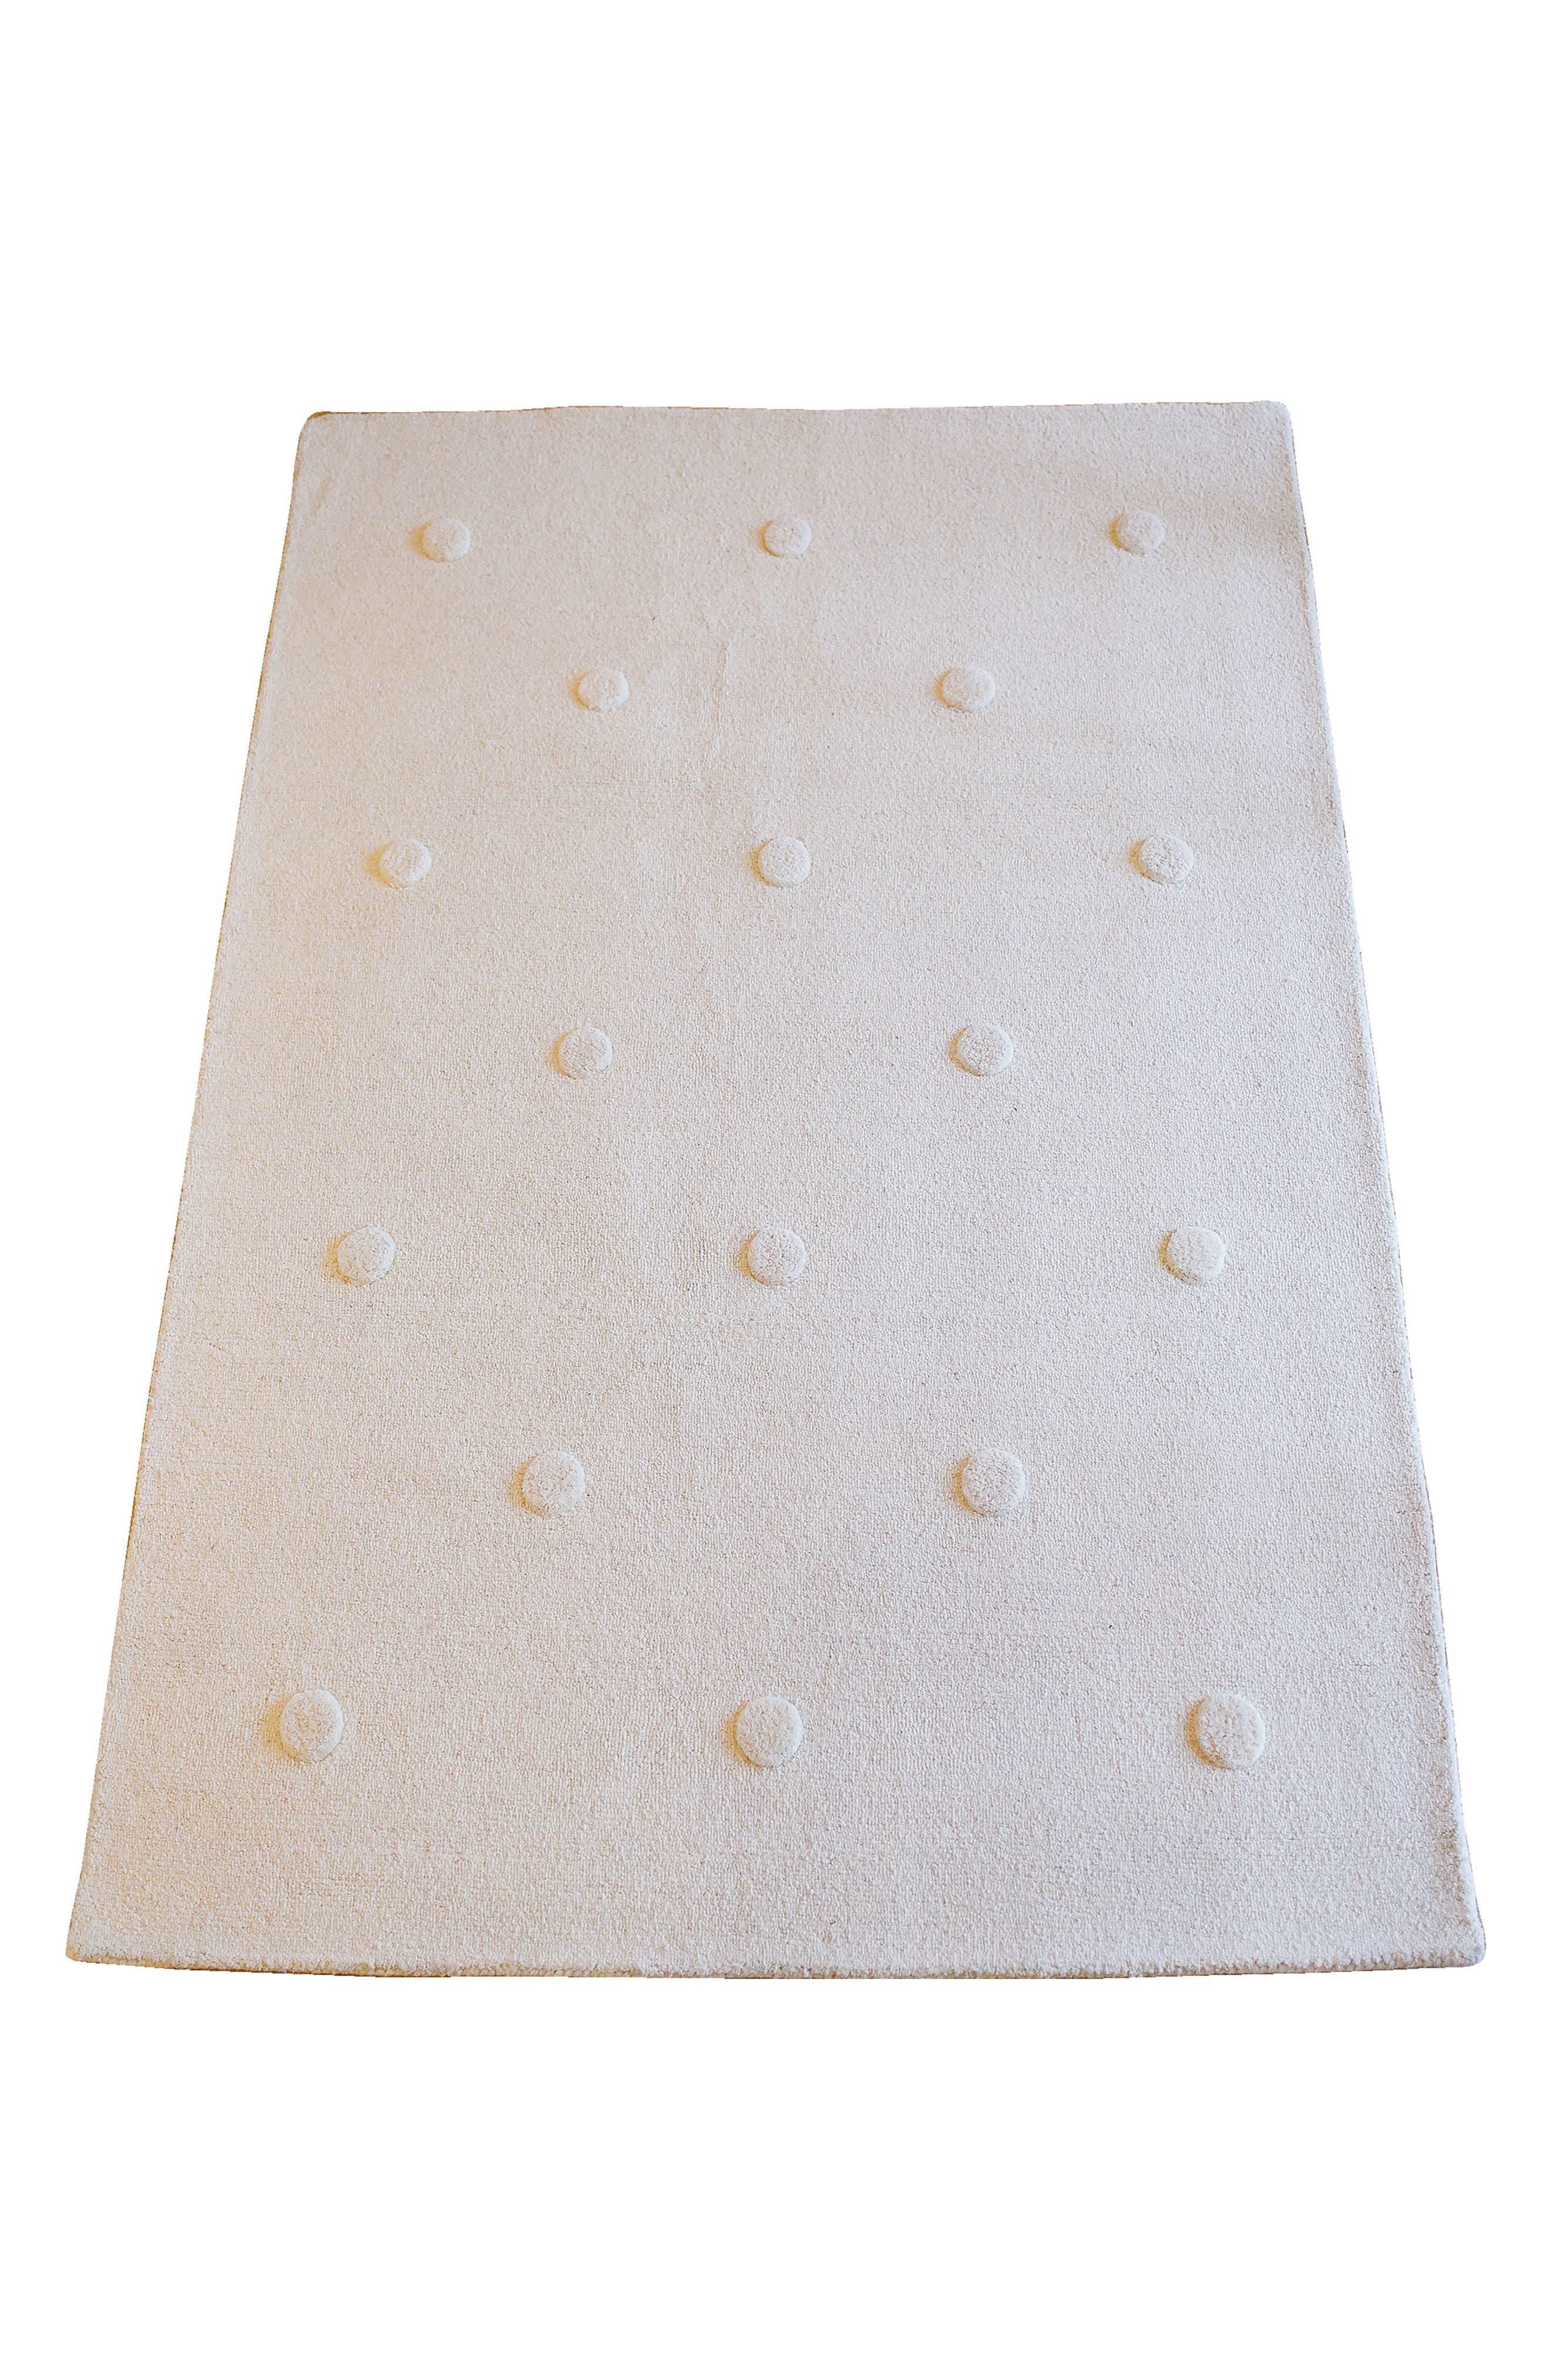 Ivory Pompom Wool Rug,                         Main,                         color, Ivory